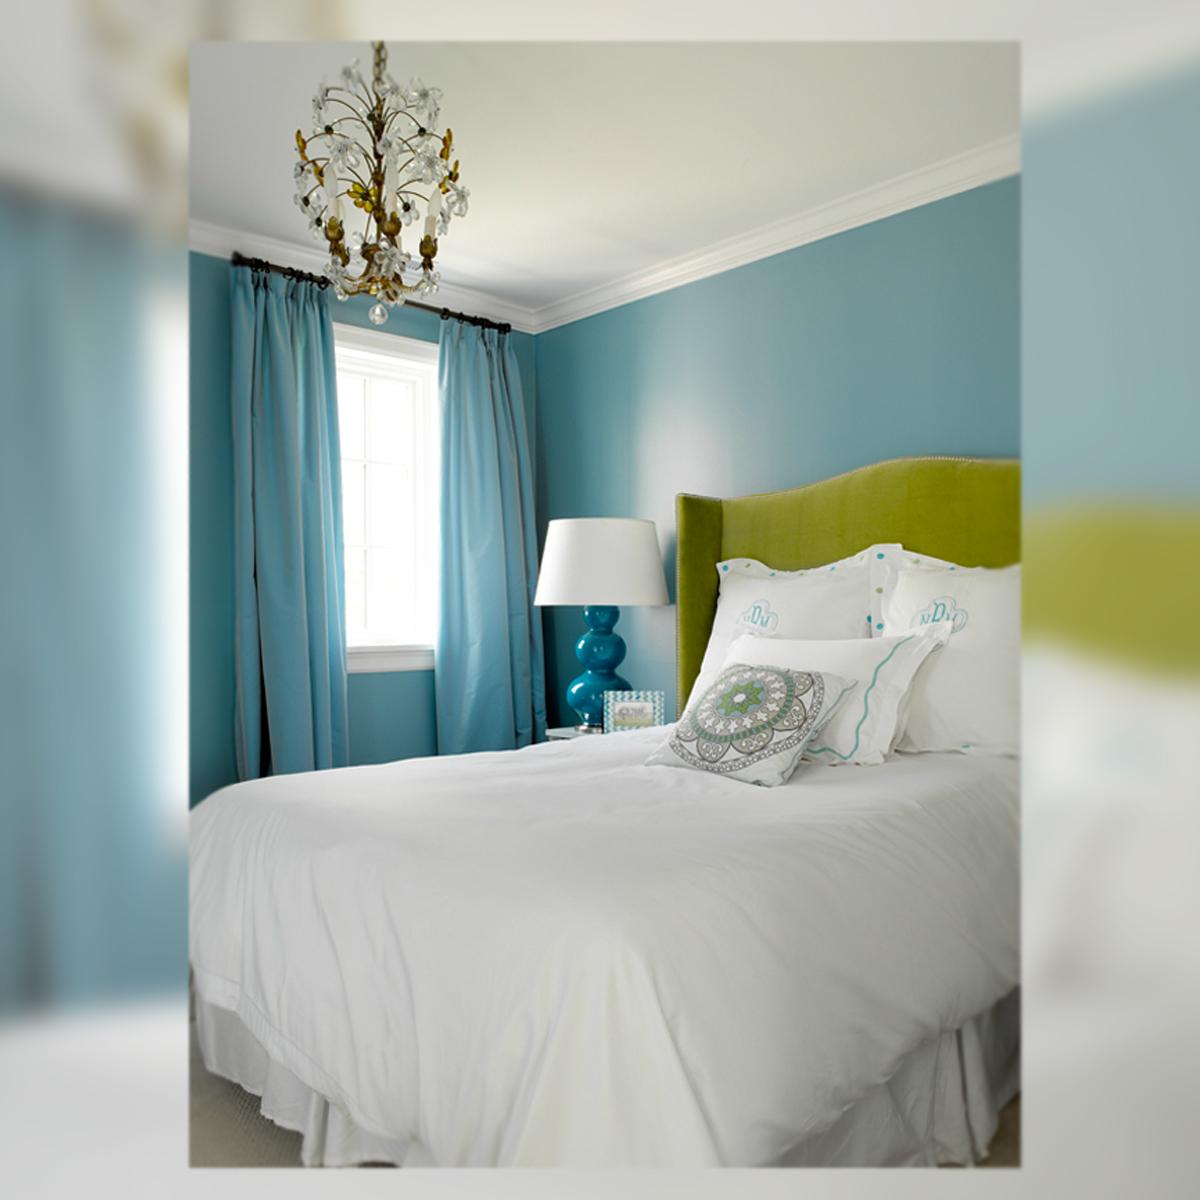 51 Pinturas Para Casas Dicas Para Pintar áreas Interna E: Diseño De Interiores Para El Hogar